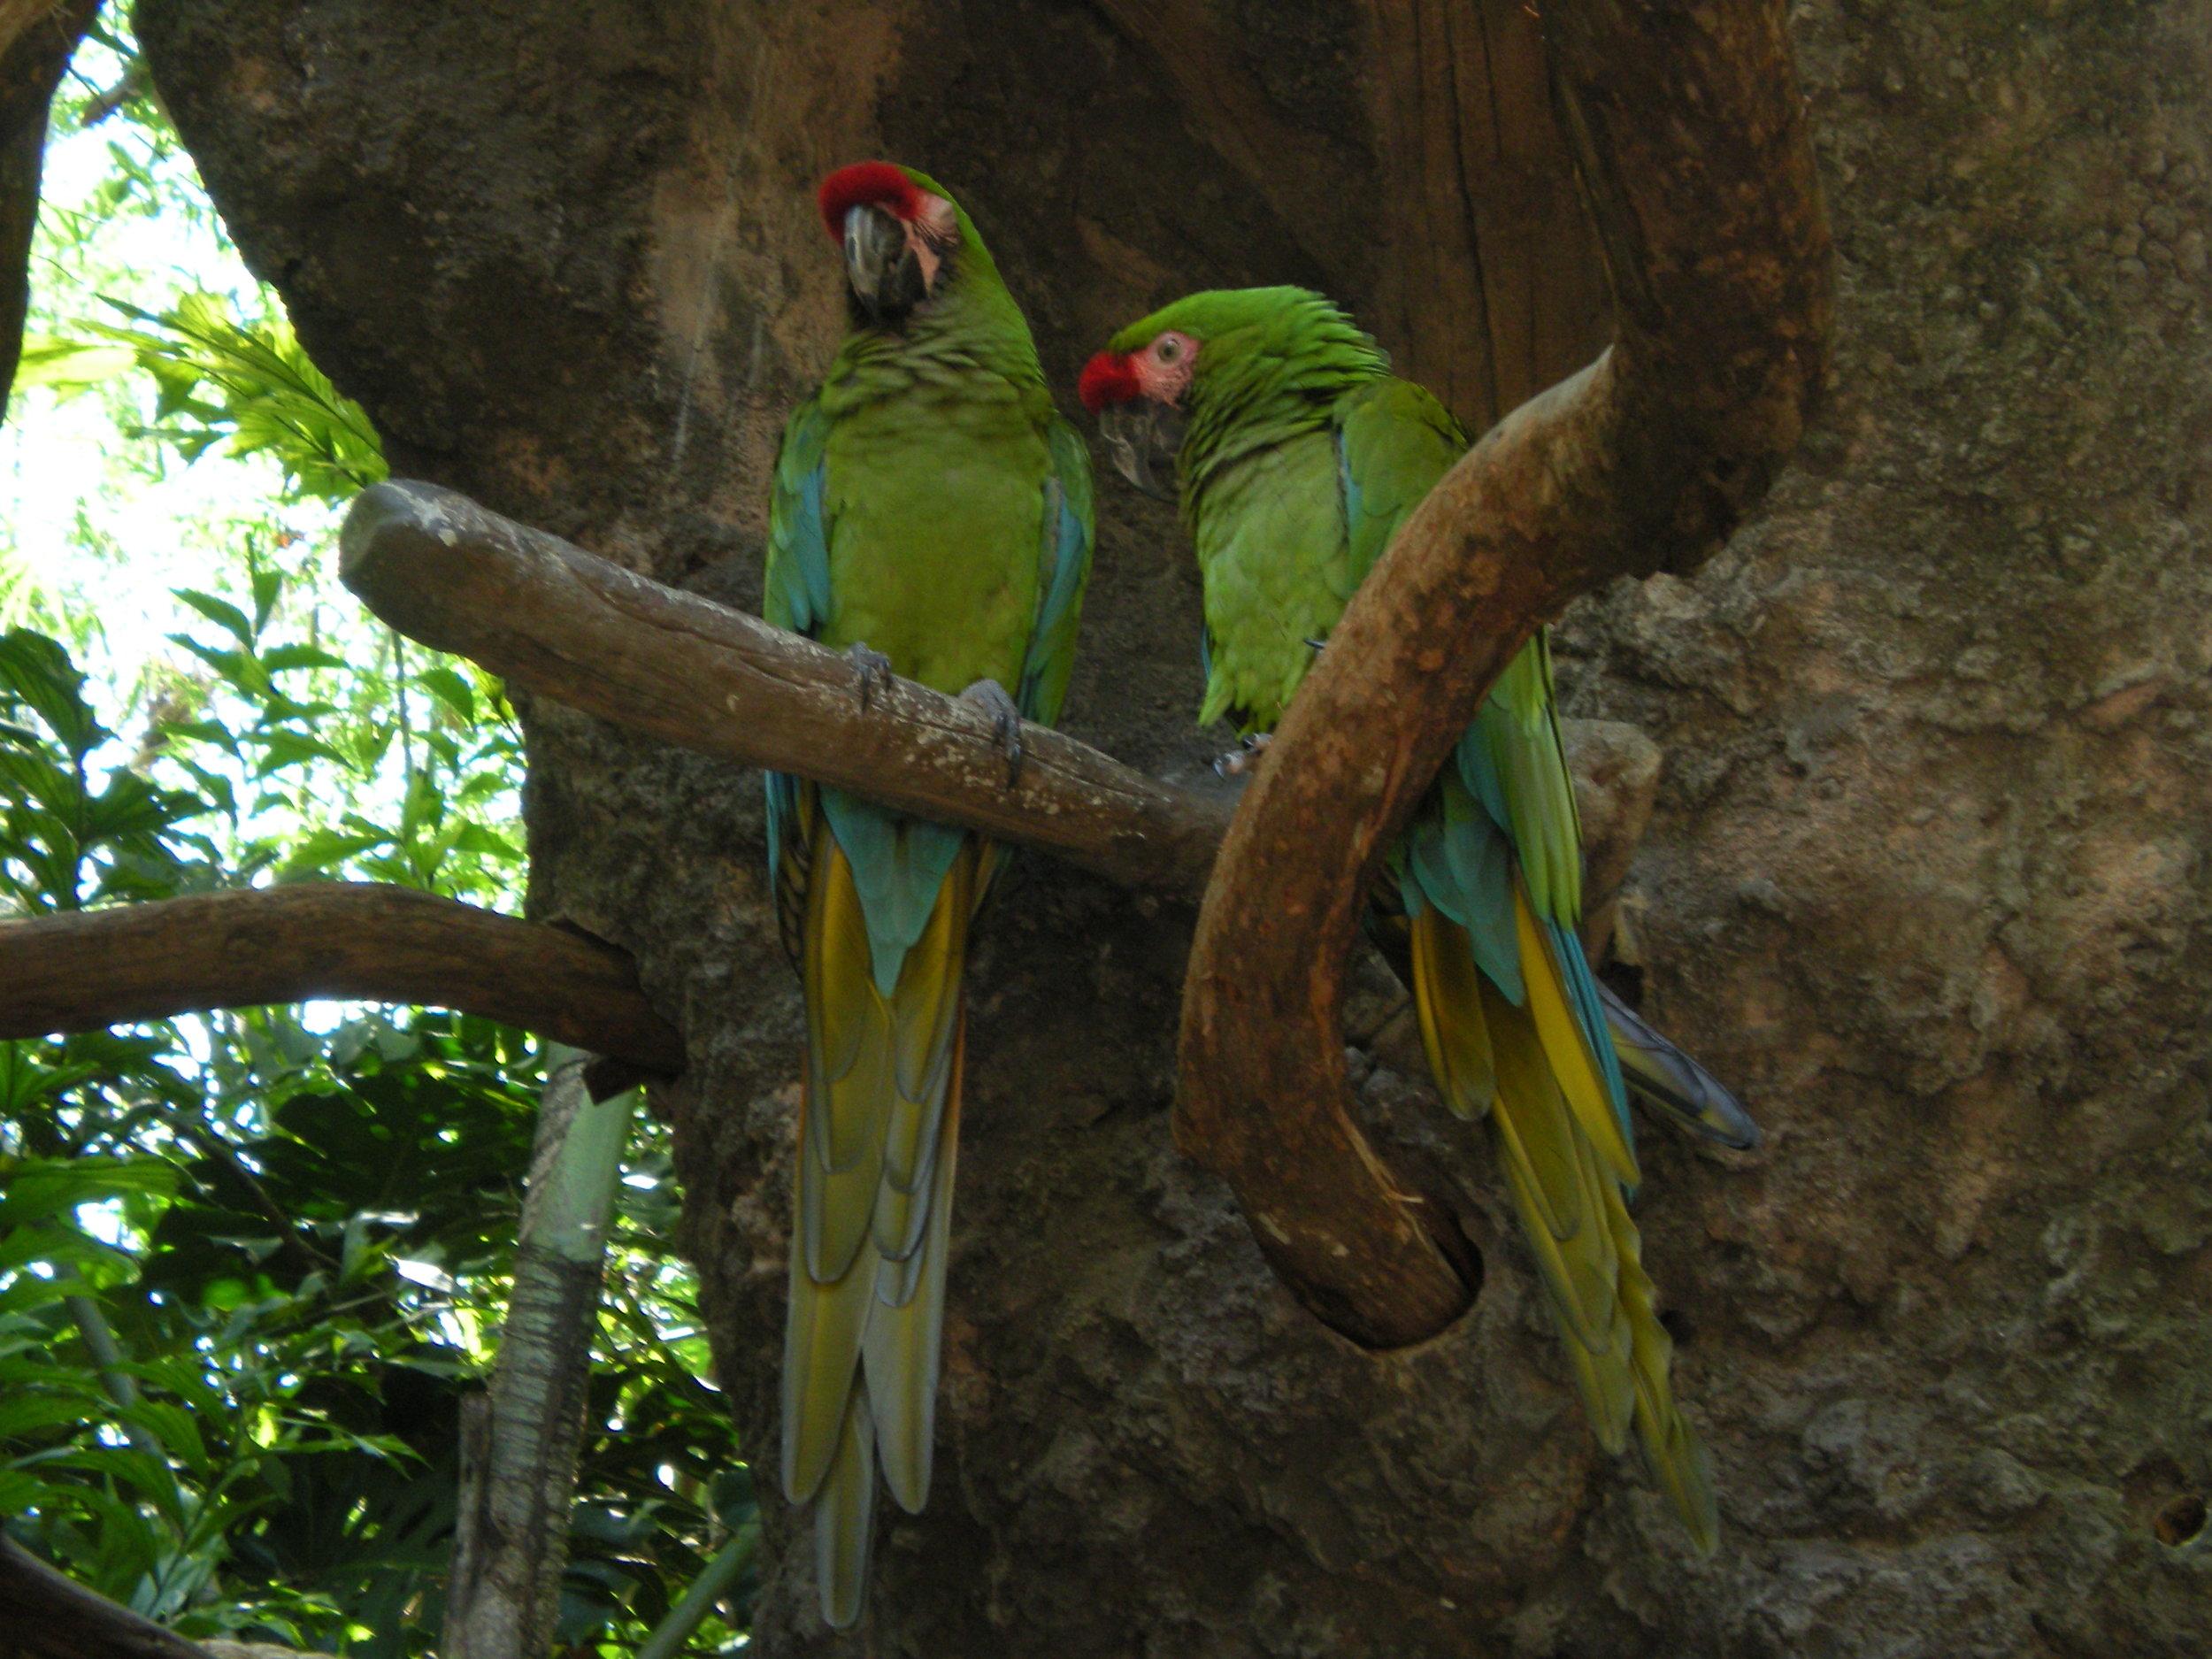 Parrots in Animal Kingdom, Walt Disney World, Florida - author's collection